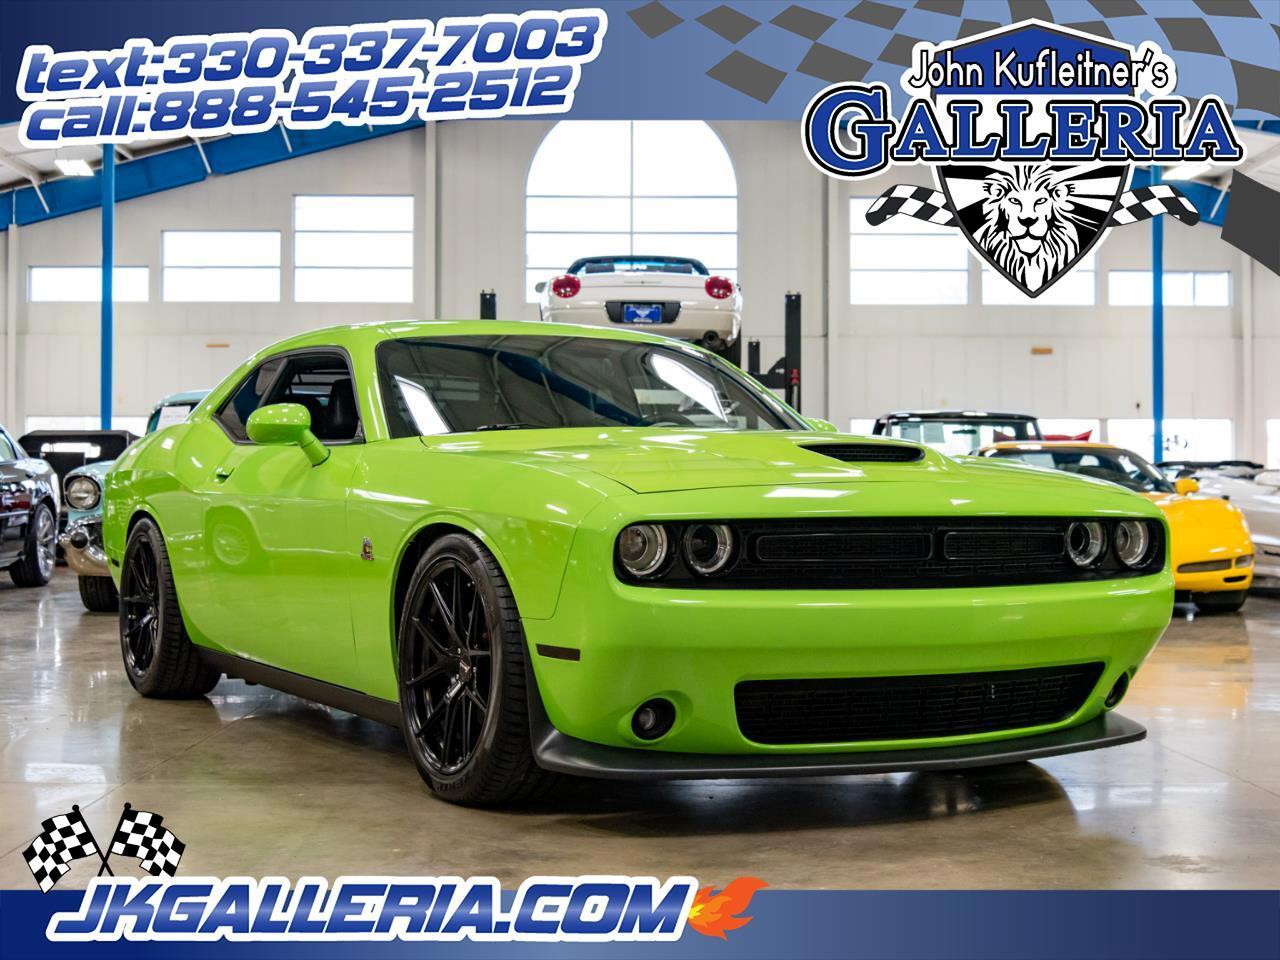 2015 Dodge Challenger 2dr Cpe R/T Scat Pack